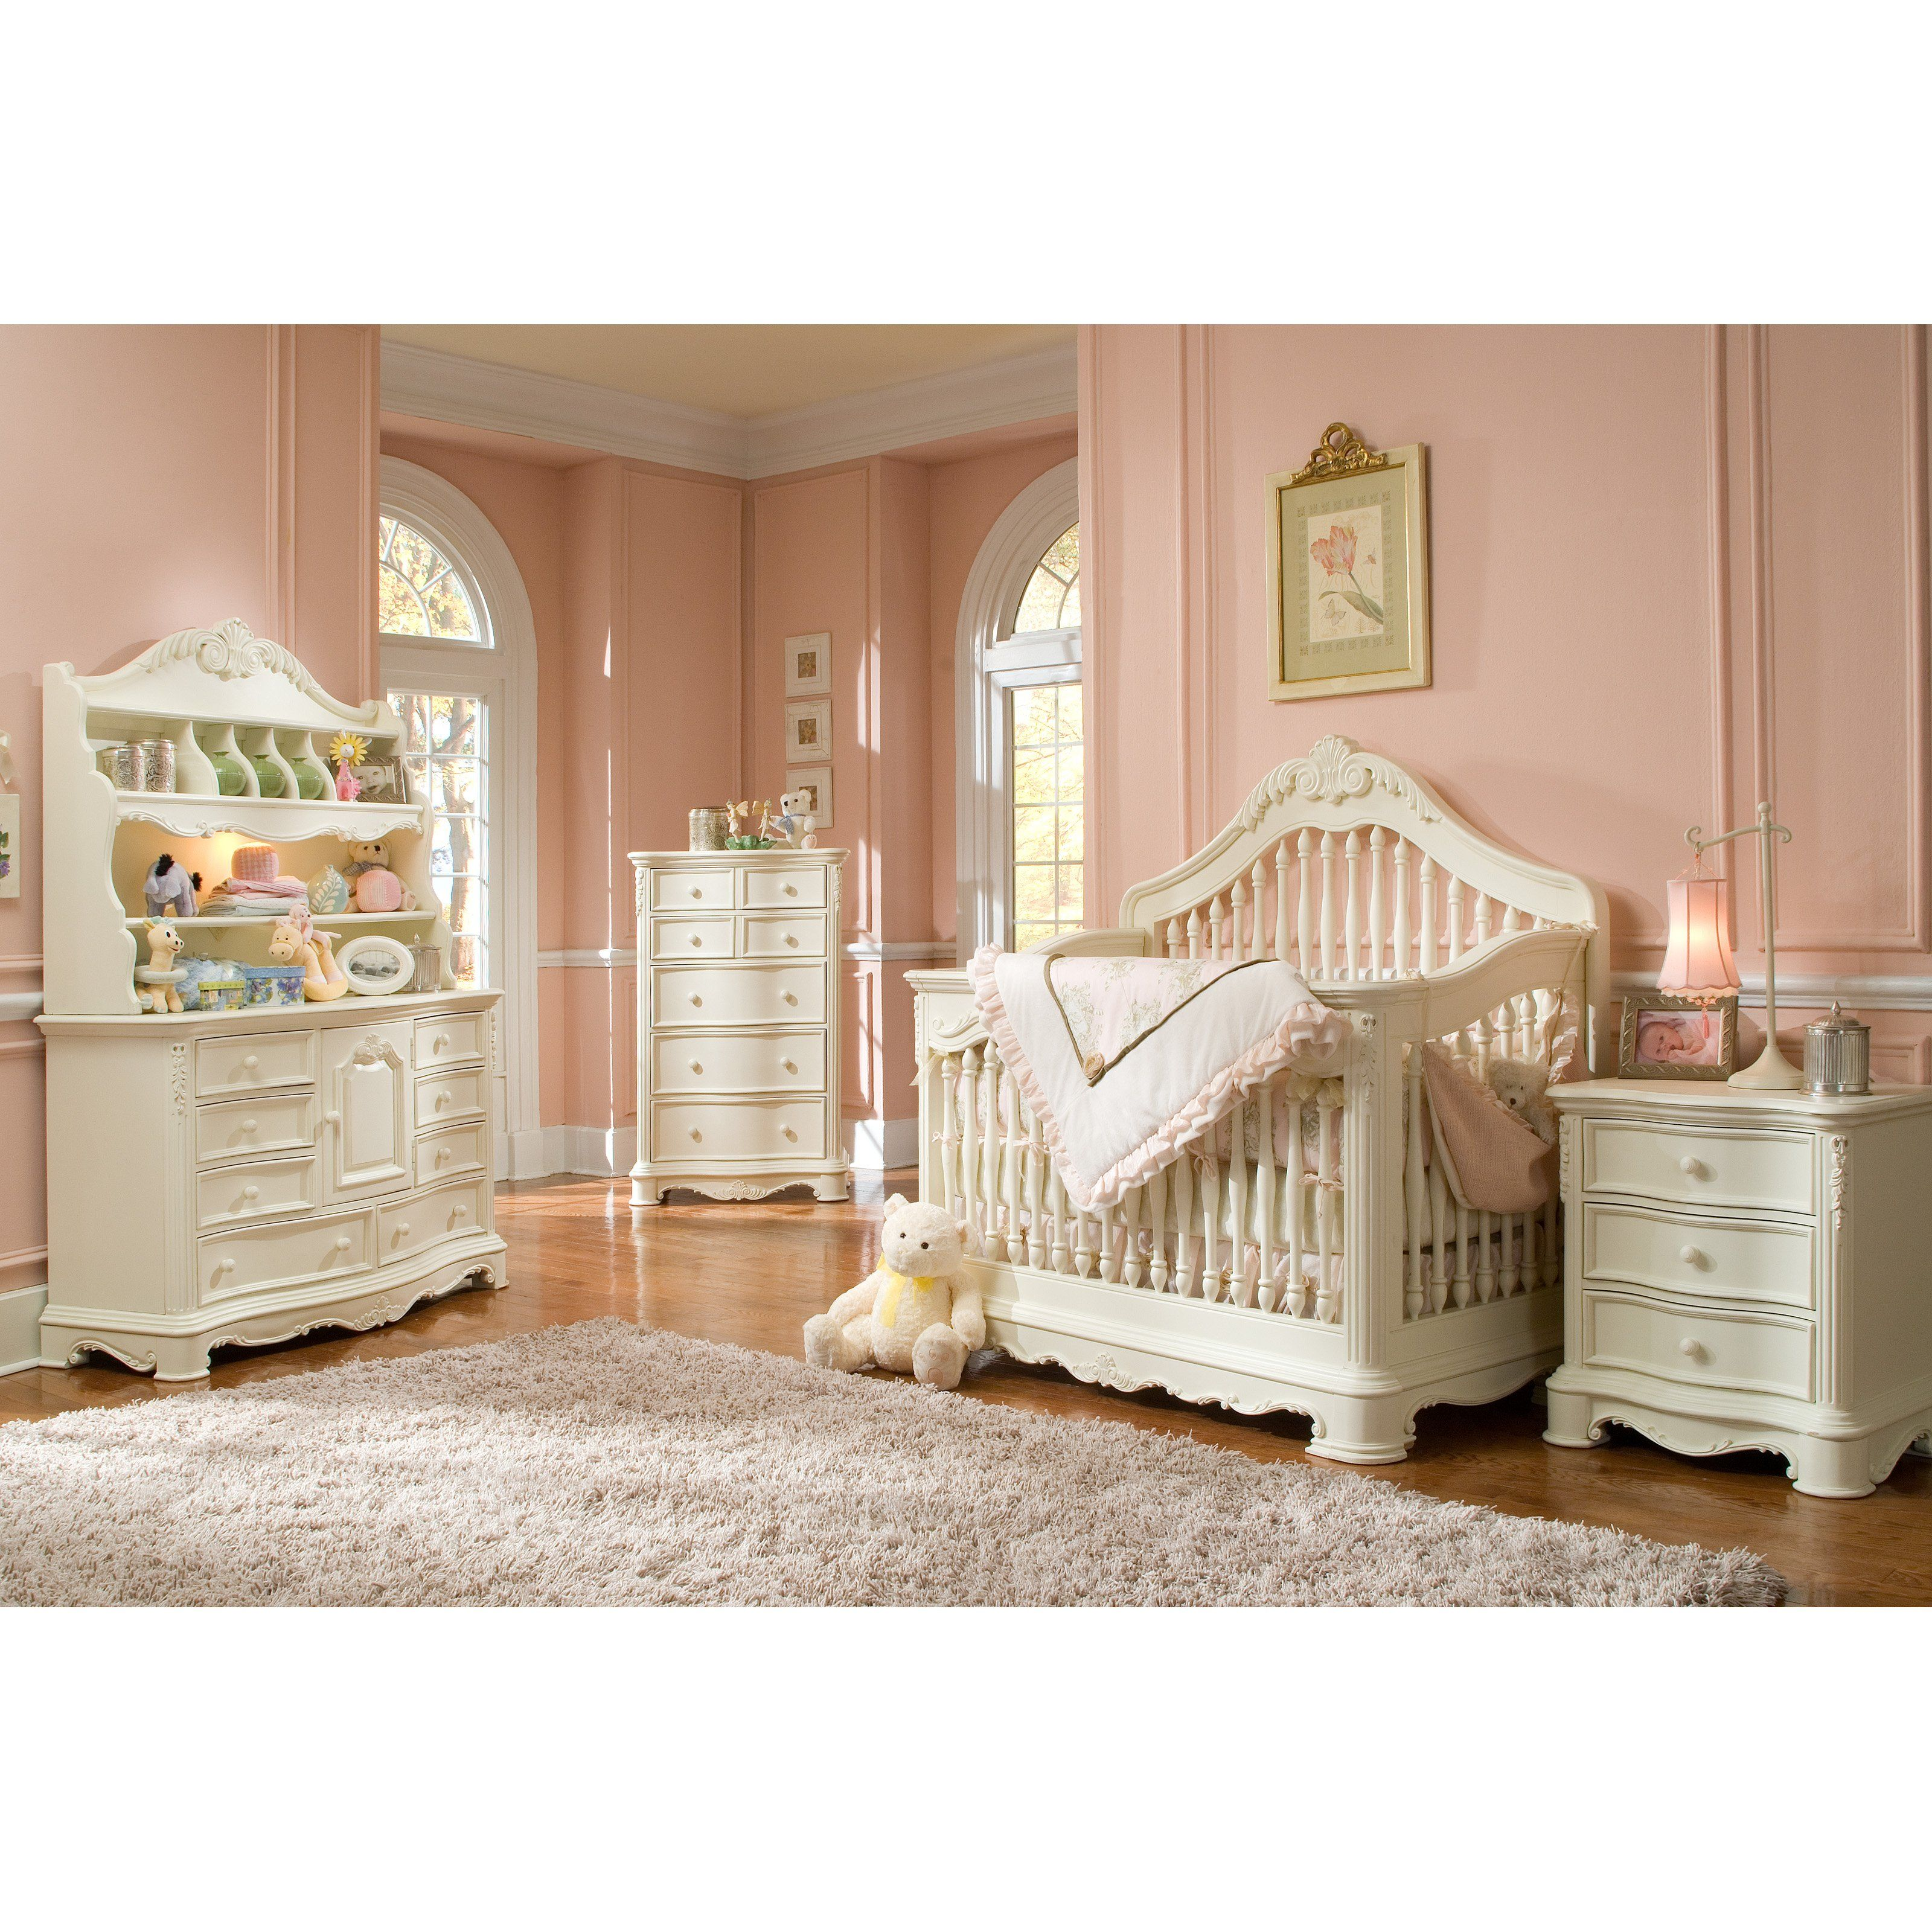 Creations baby venezia crib collection 899 98